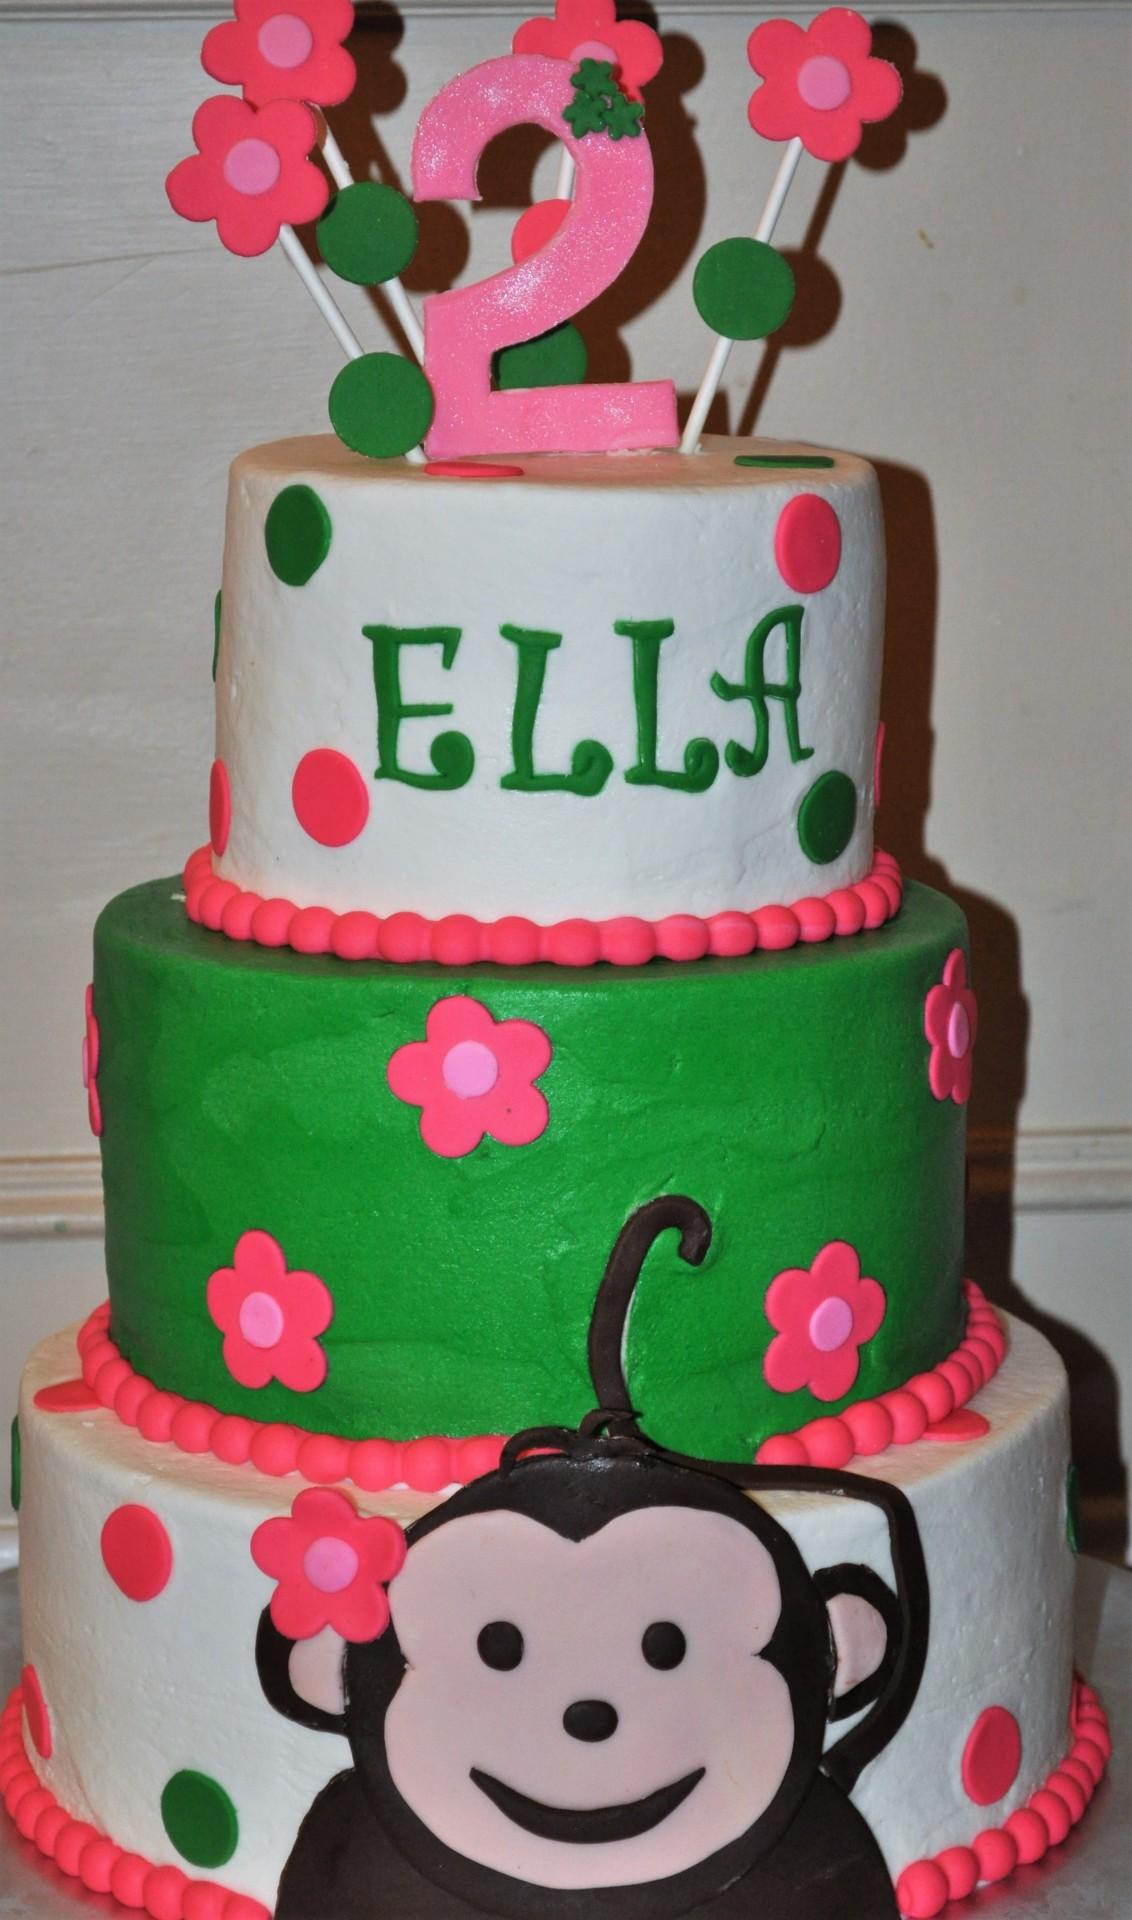 Monkey theme birthdya cake, tiered cake, 2nd birthday cake